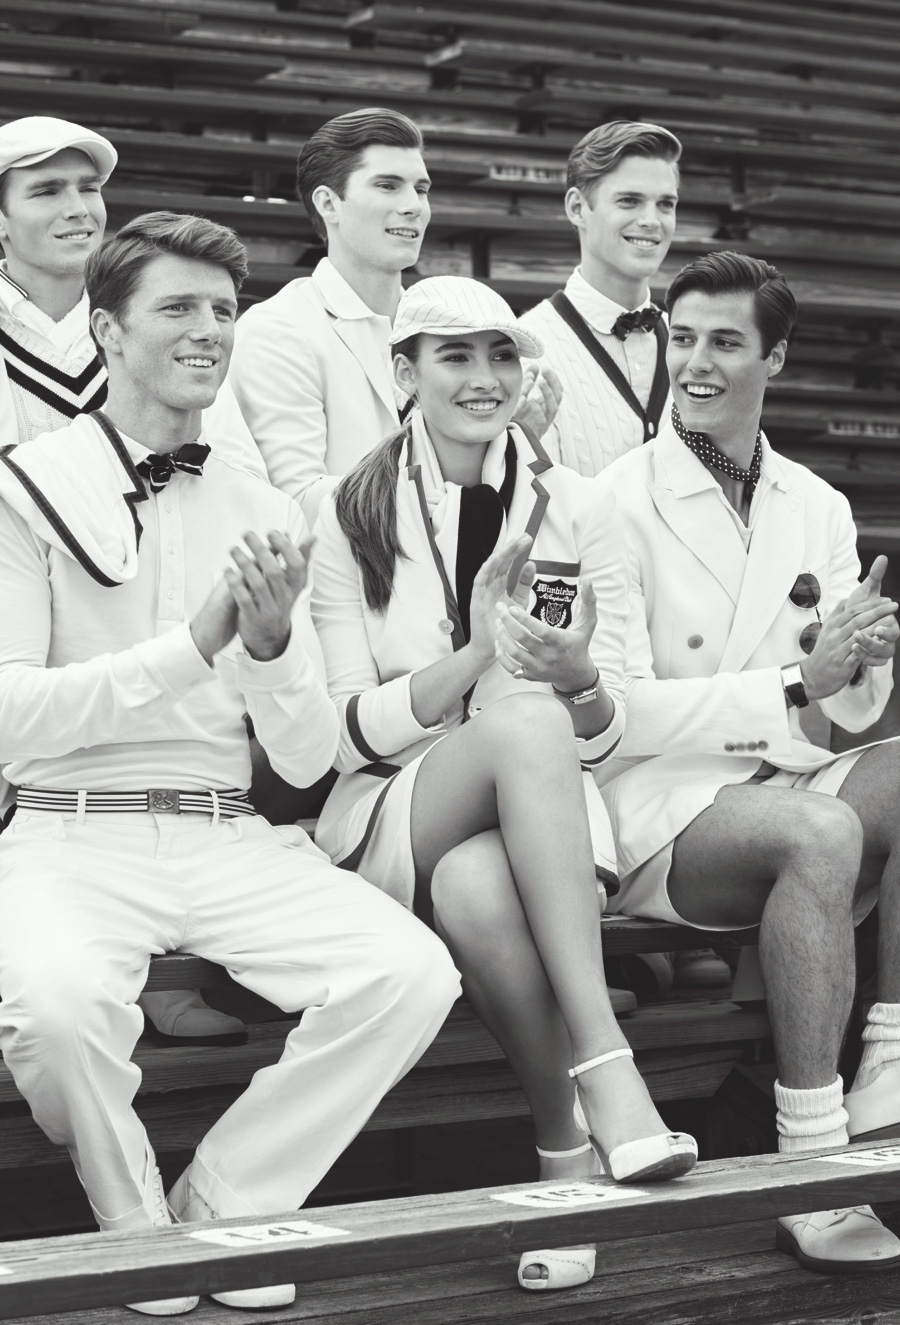 Ralph Lauren Celebrates 10th Anniversary as Wimbledon Sponsor